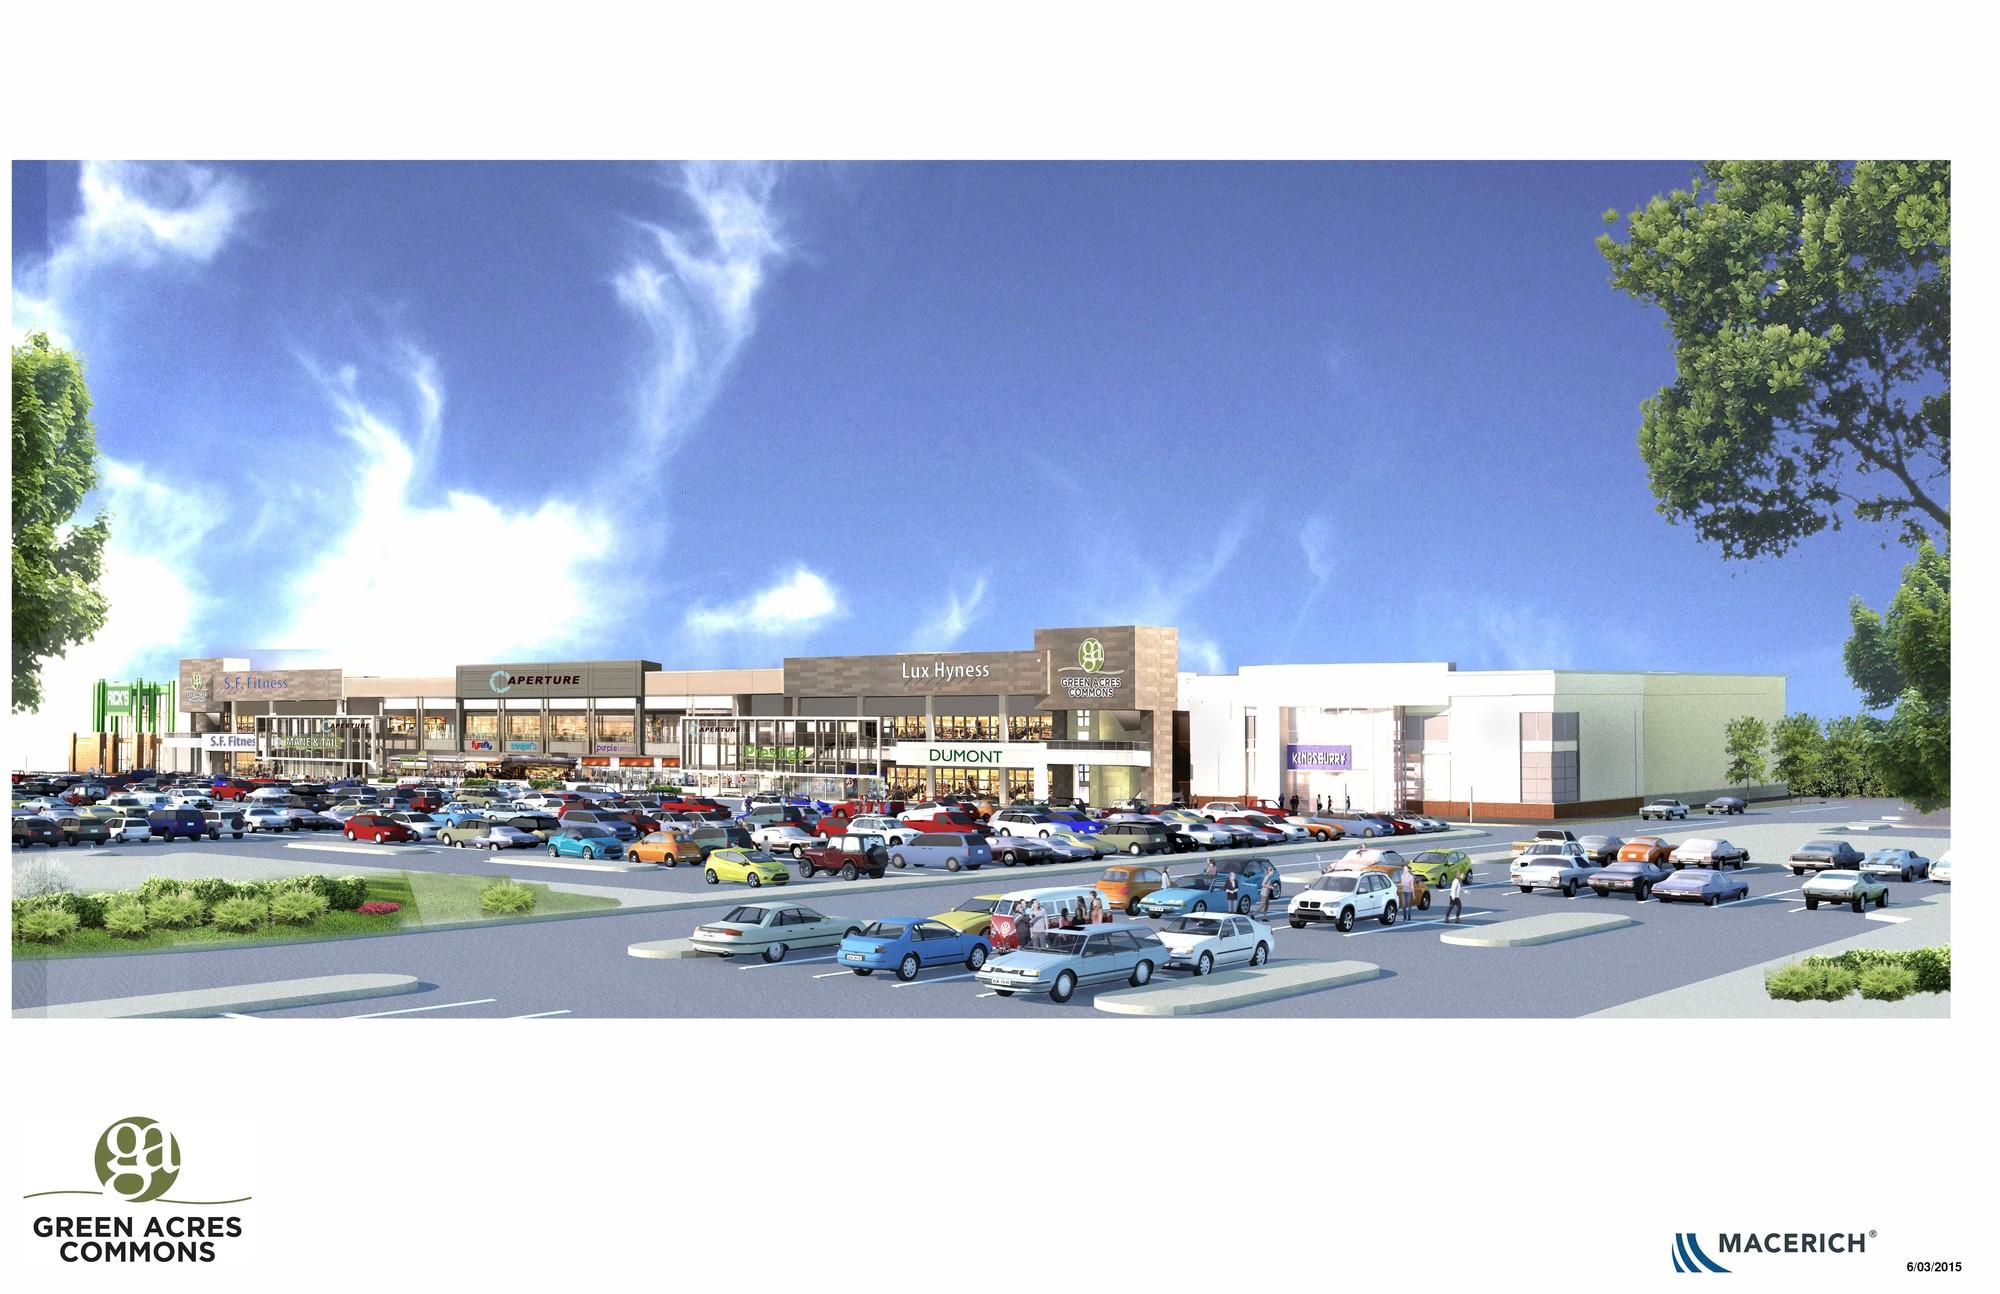 100 New Retailer To Open In Neiman Marcus Latest Luxury  : 14448447986686 from ipswichstonesoup.com size 2000 x 1294 jpeg 511kB